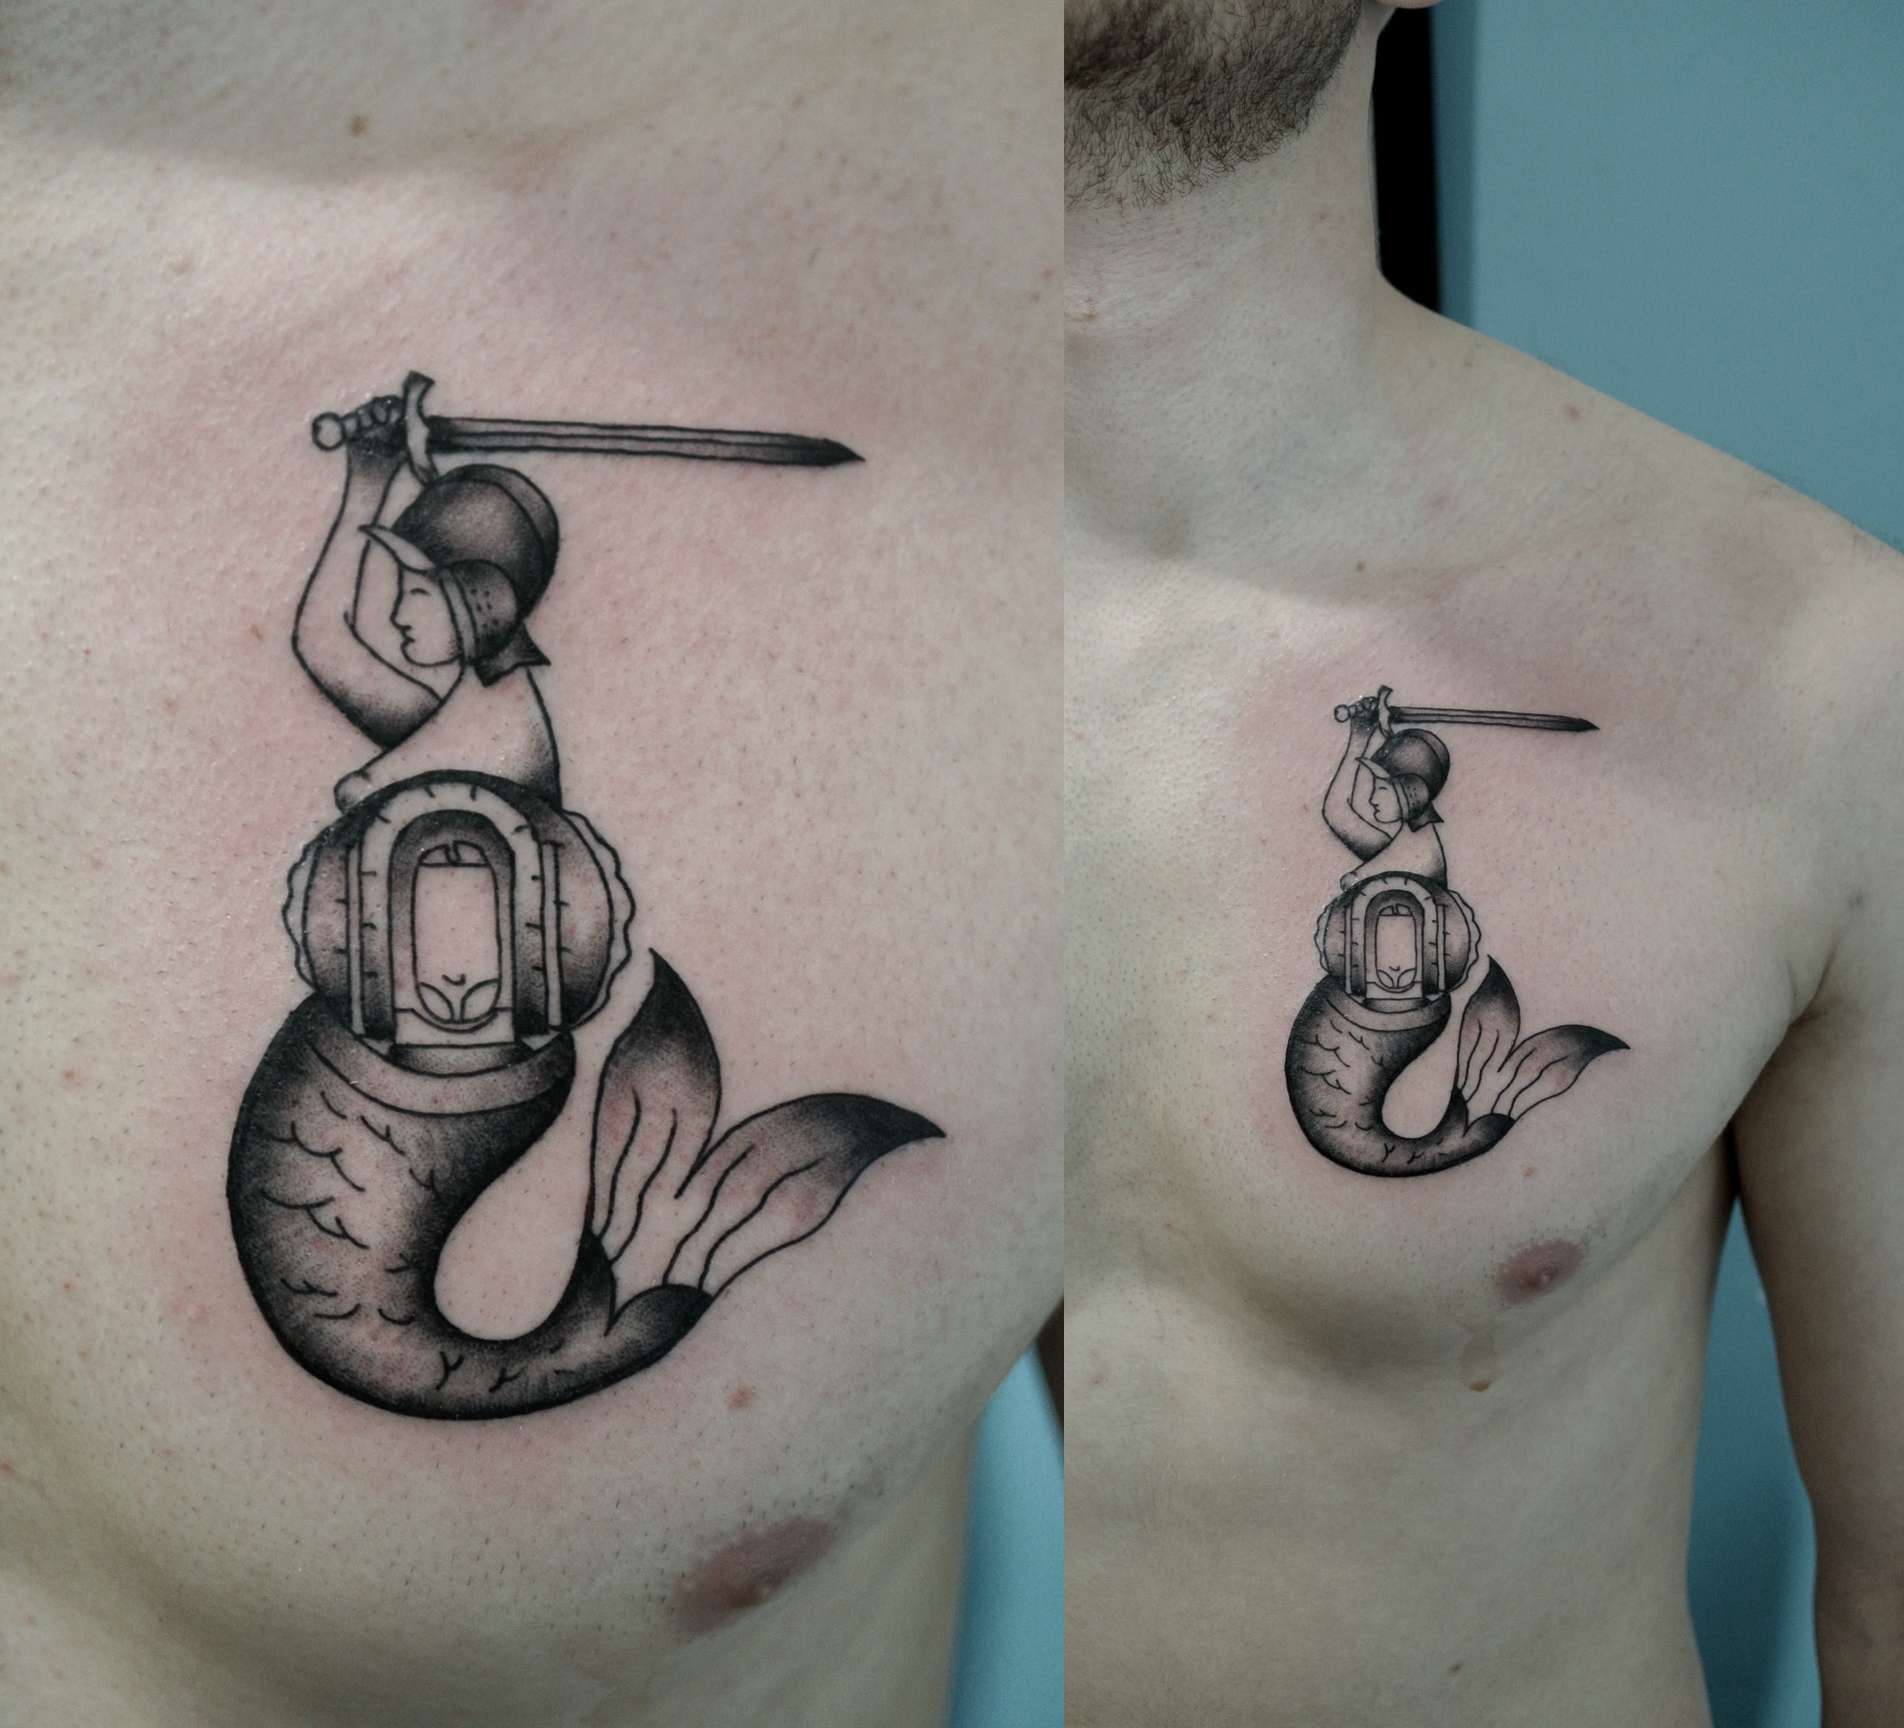 Inksearch tattoo Kris too late